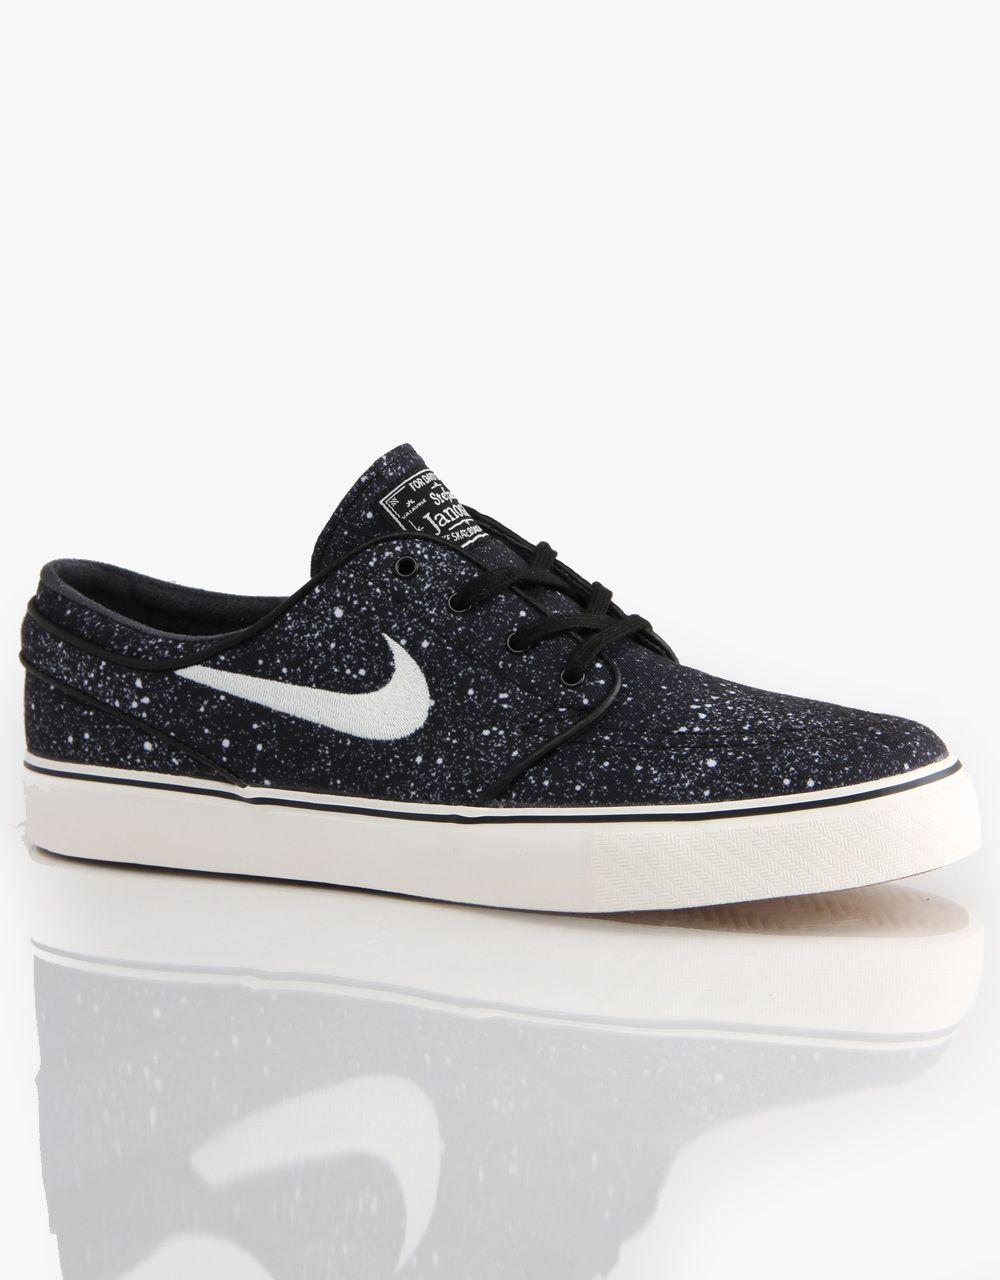 Nike SB Zoom Stefan Janoski Premium Skate Shoes Black